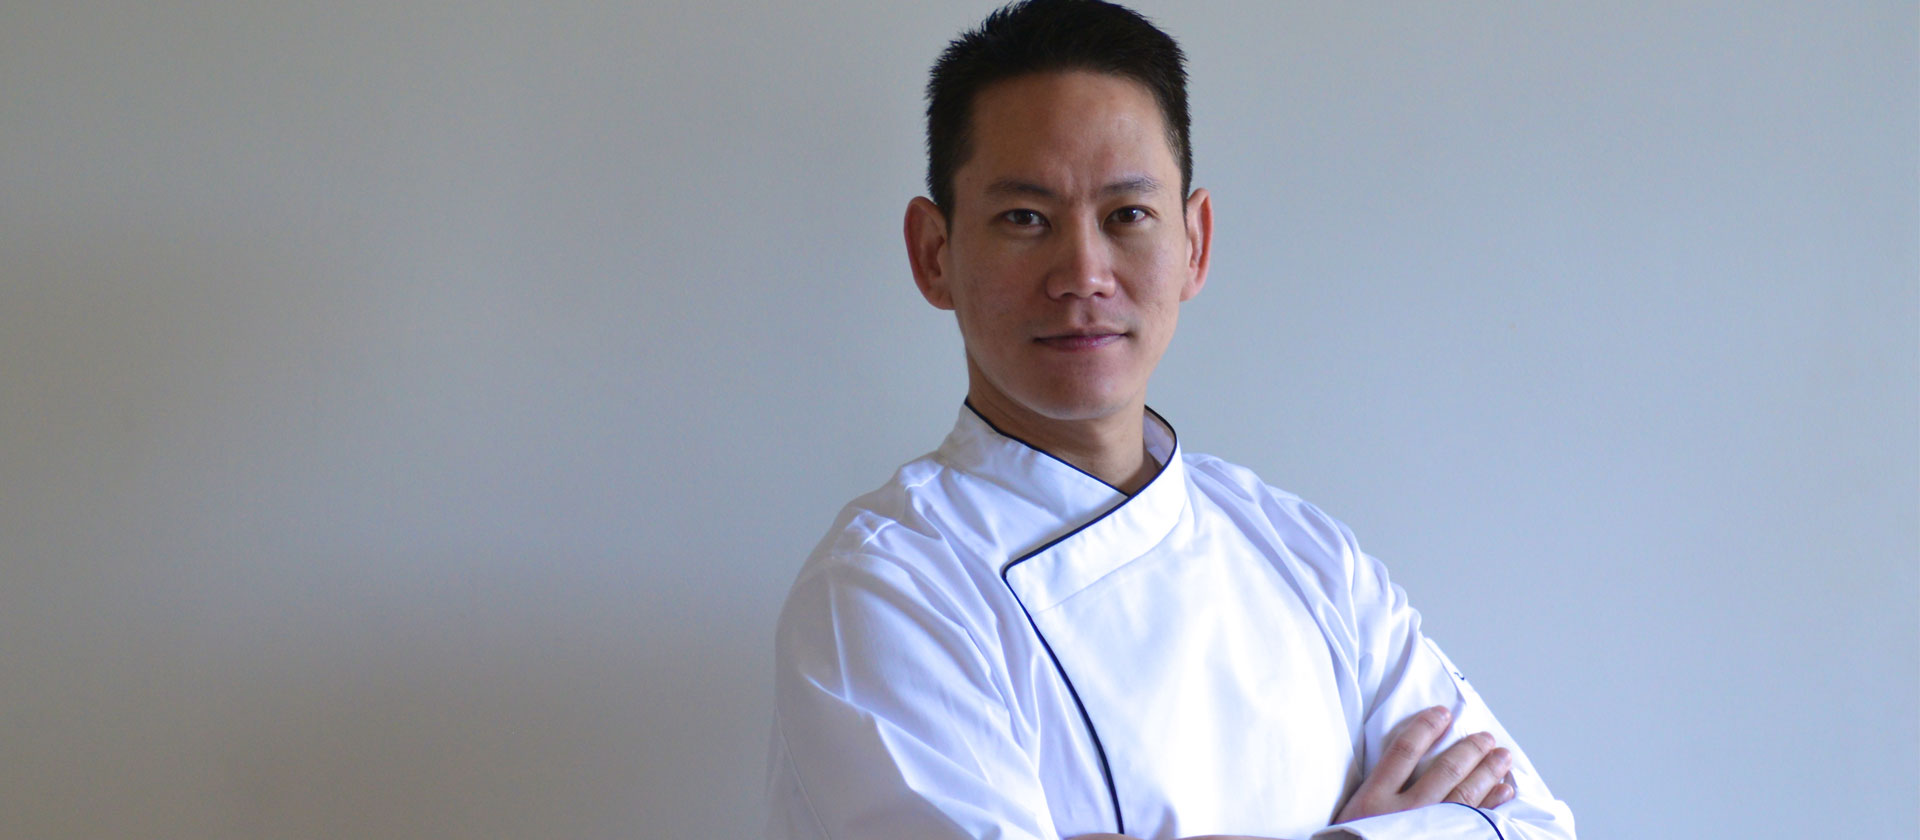 Alumni Kong Suetrong Success Story - Le Cordon Bleu London